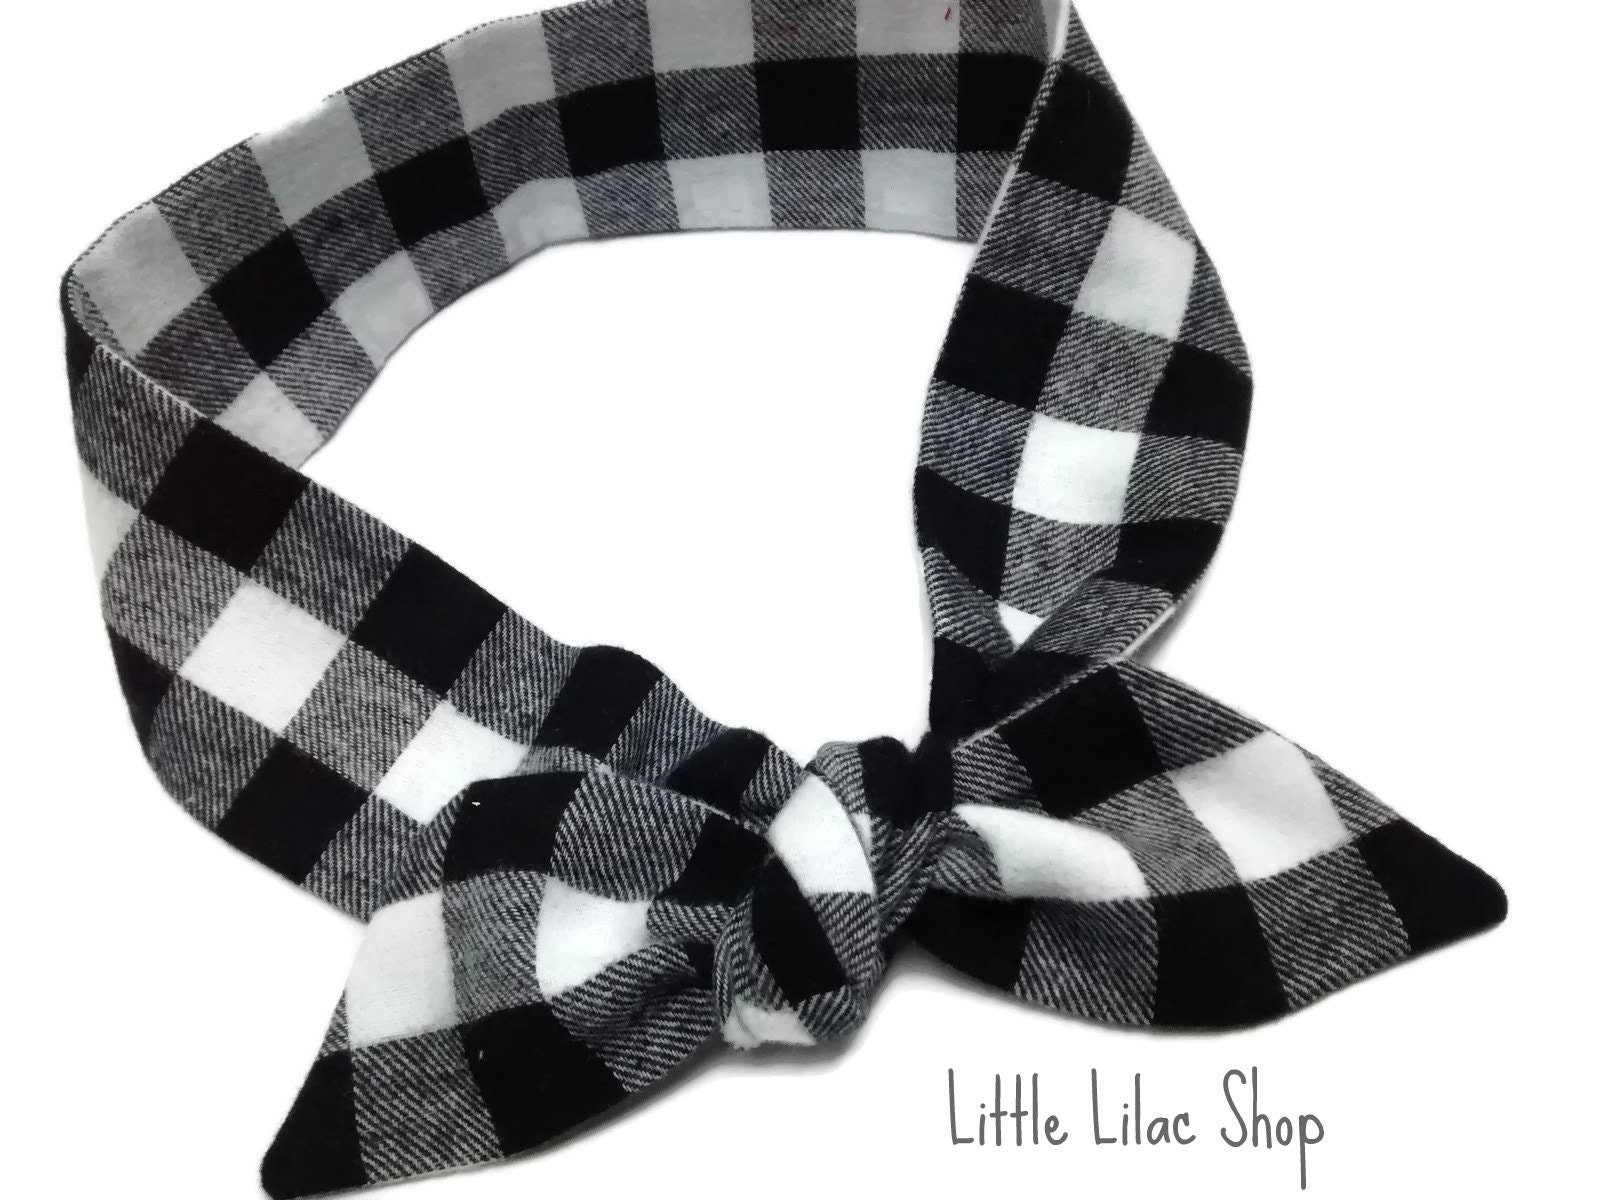 b3d54e0a6b205 Headband for Women, Black and White Check Flannel Headband, Buffalo Plaid  Flannel, Self Tie Headband, Plaid Top Knot, Rockabilly Headband